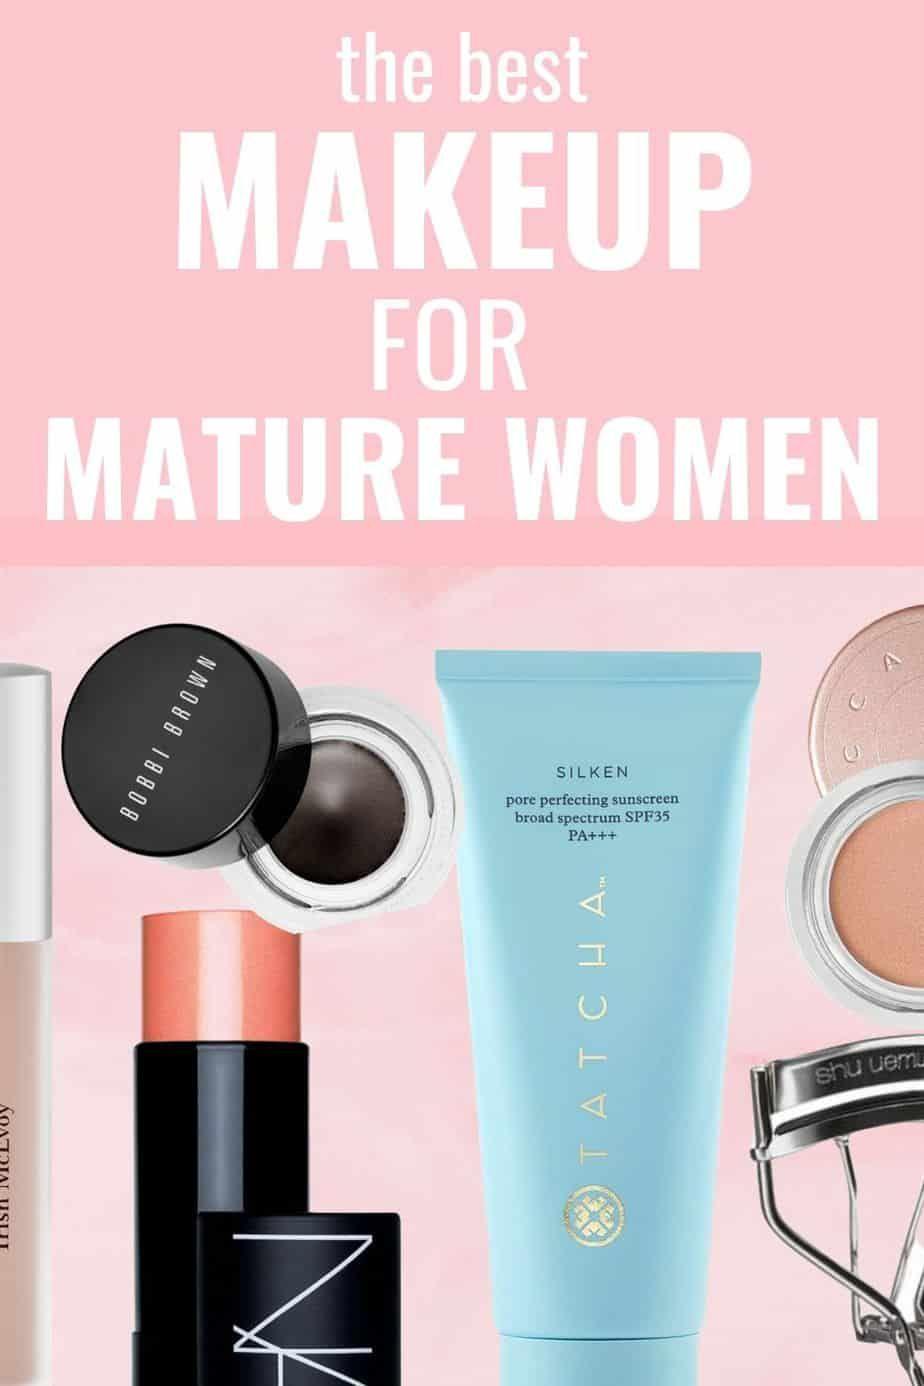 Top 10 Makeup Tricks to Look Younger | Makeup tips for